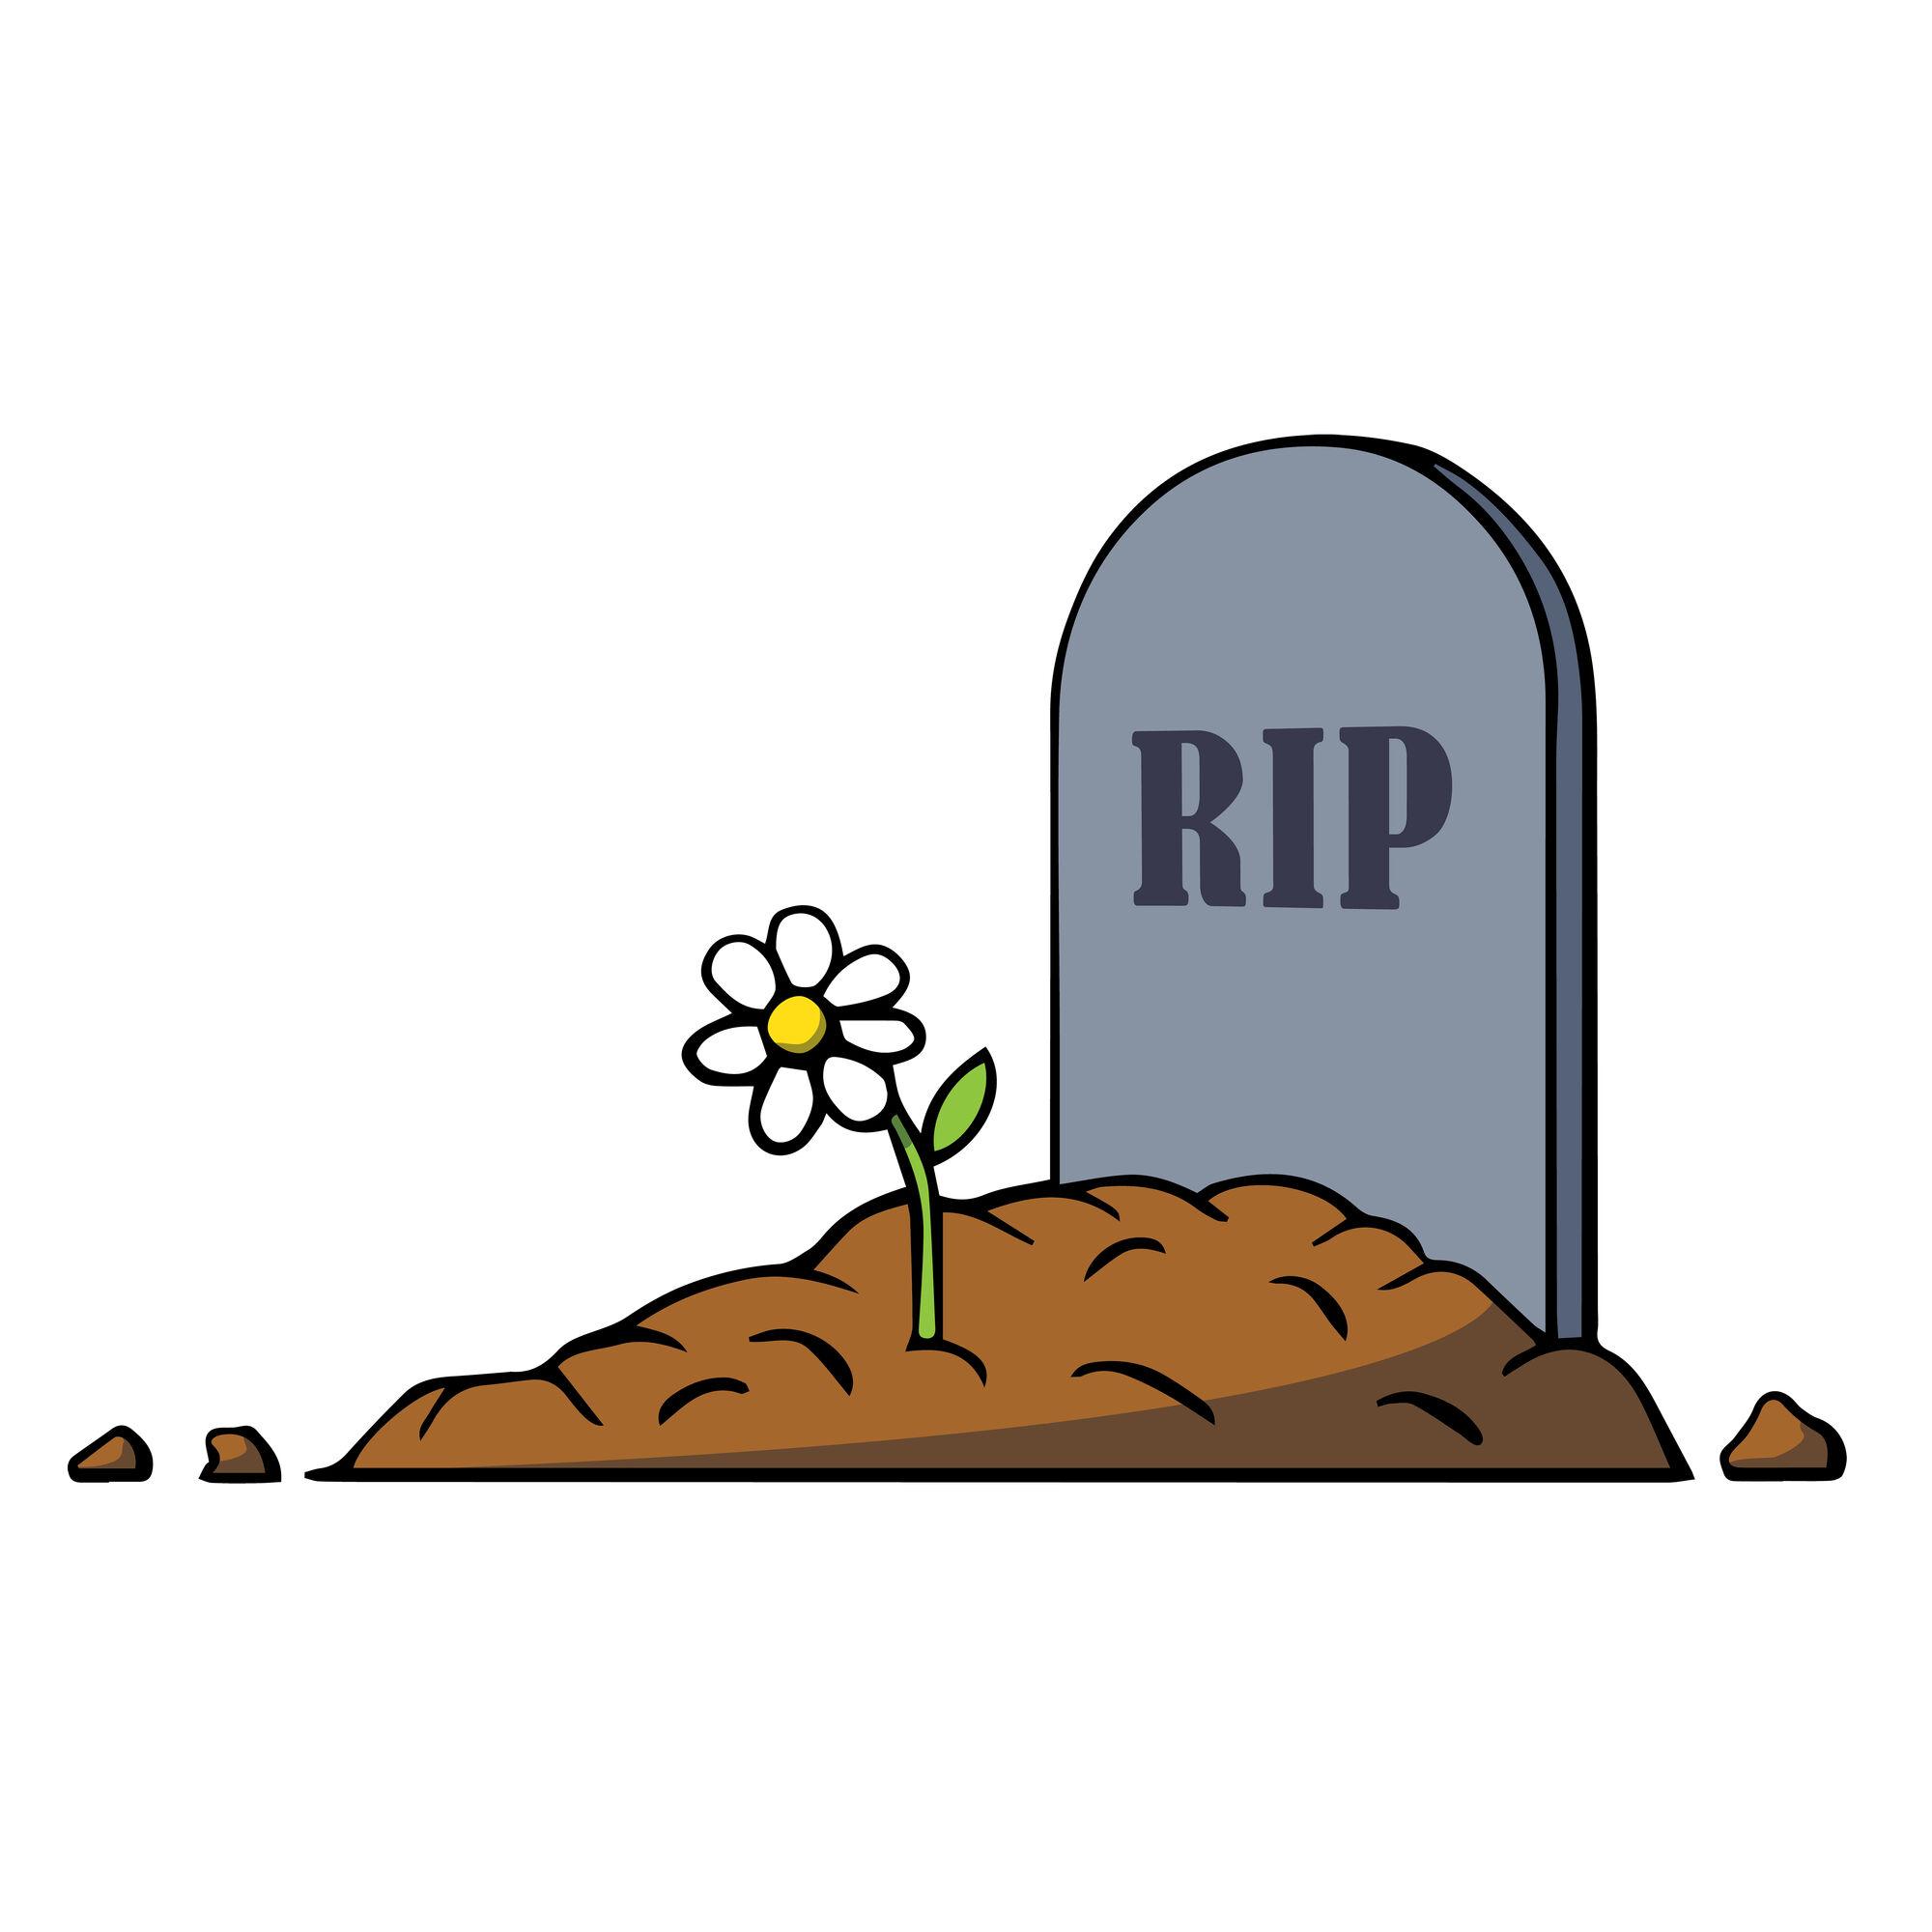 image 02508a3fb753f0dfd65c4e0acb2c8a70 gravestone cartoon 1 rip rh justdance wikia com halloween tombstone clipart tombstone silhouette clip art